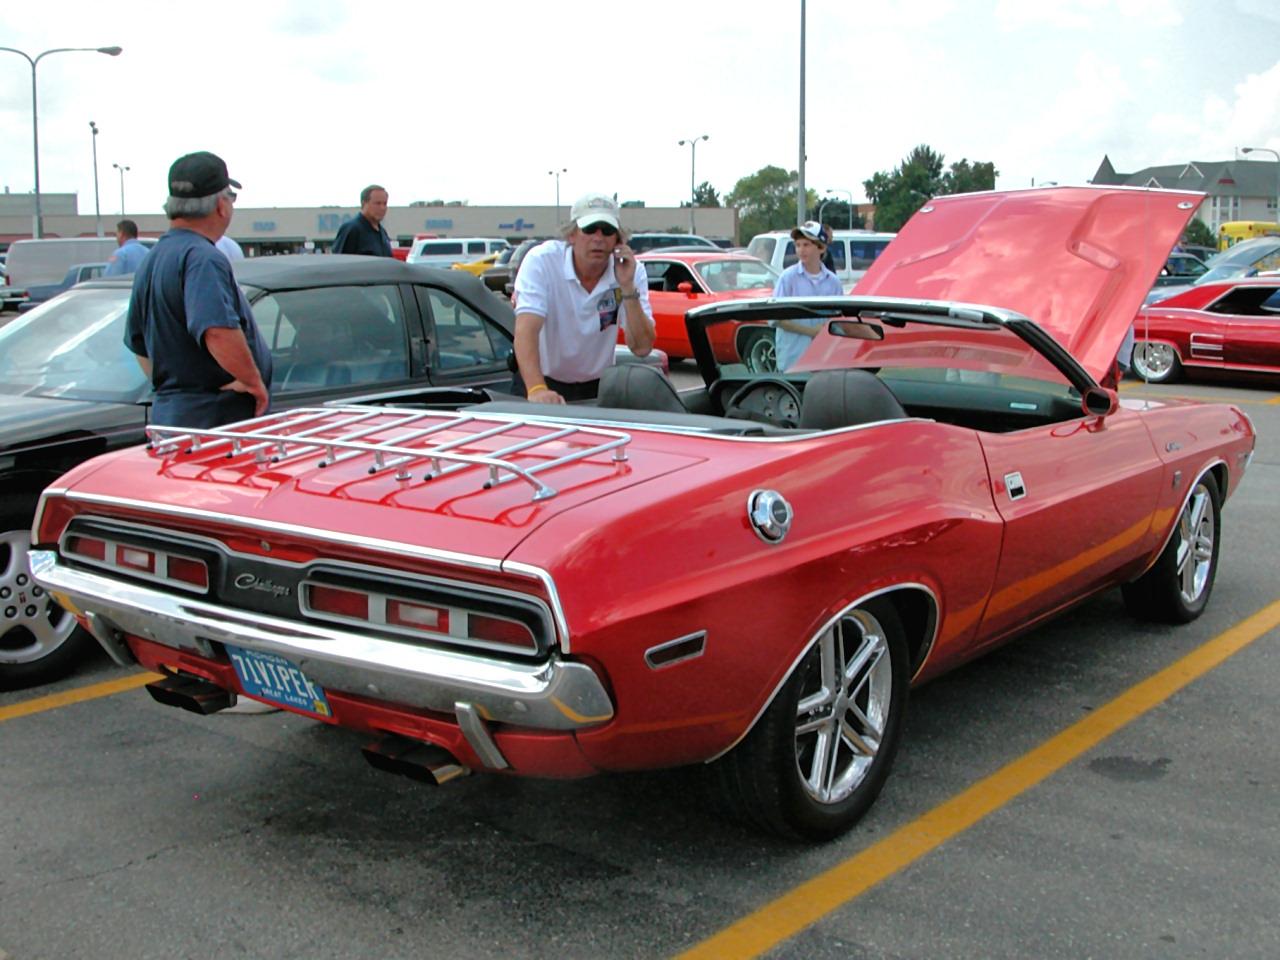 1971 Dodge Challenger Convertible W 8 0L Viper V 10 Engine Bright Red Rvr 2005 Dream Cruise N